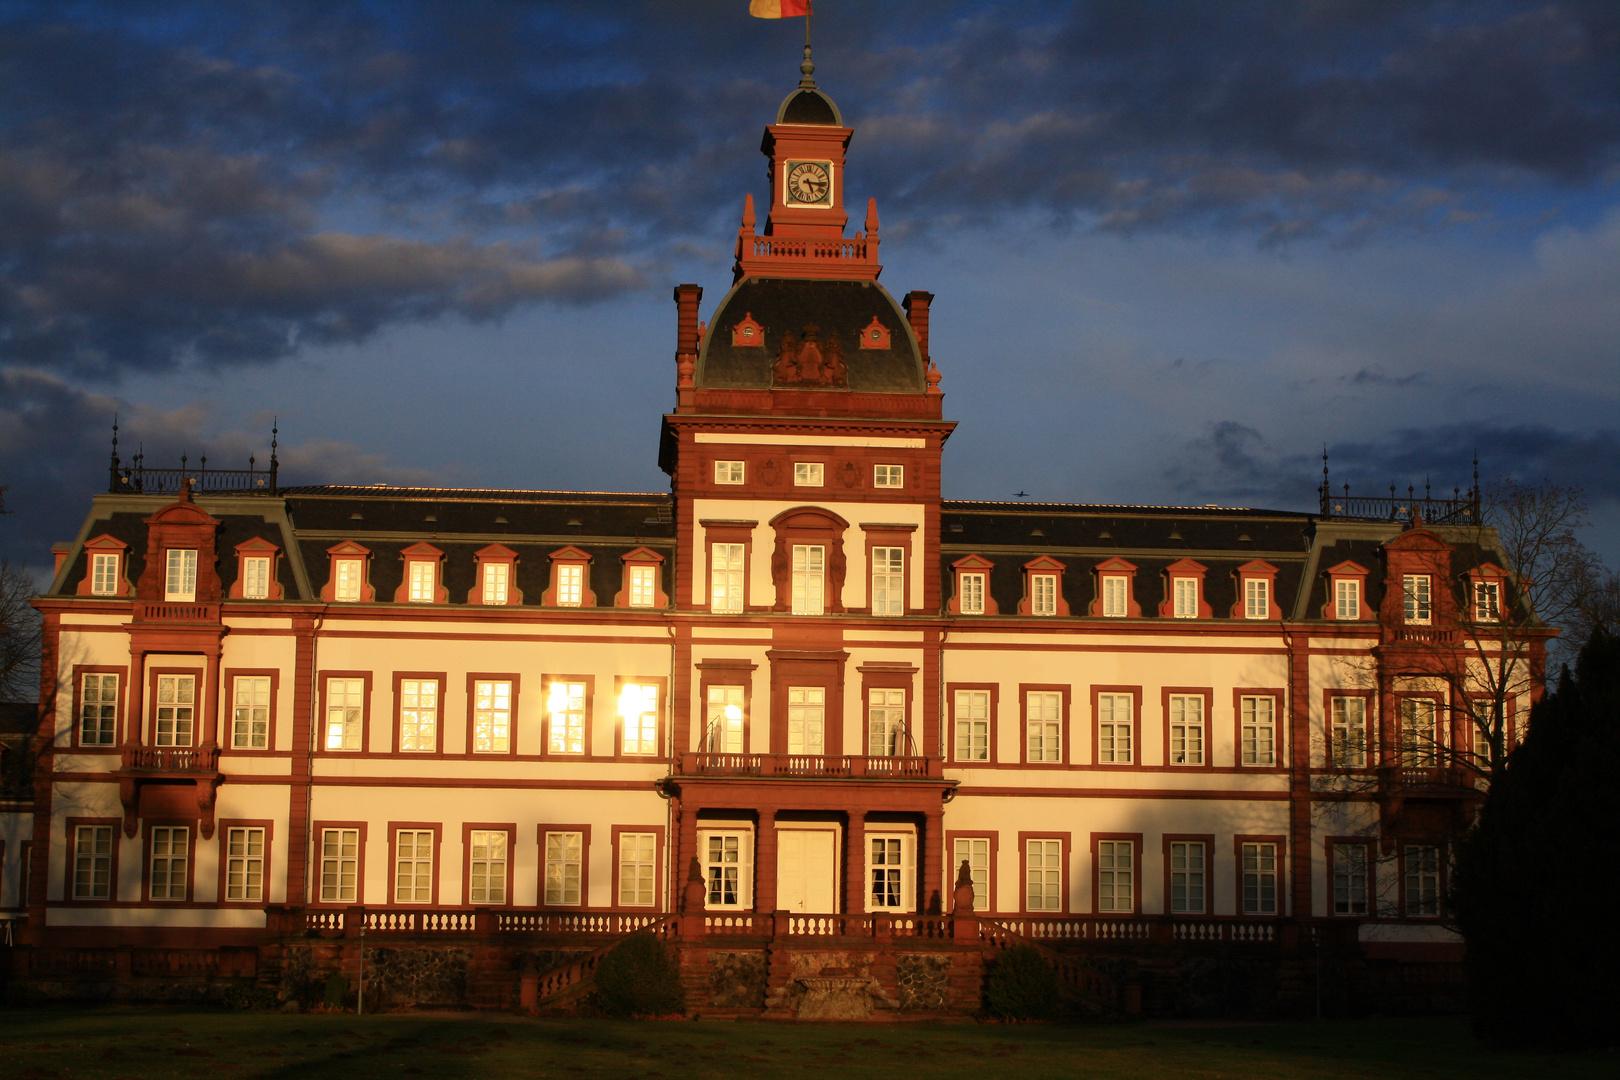 Schloss Philipsruh